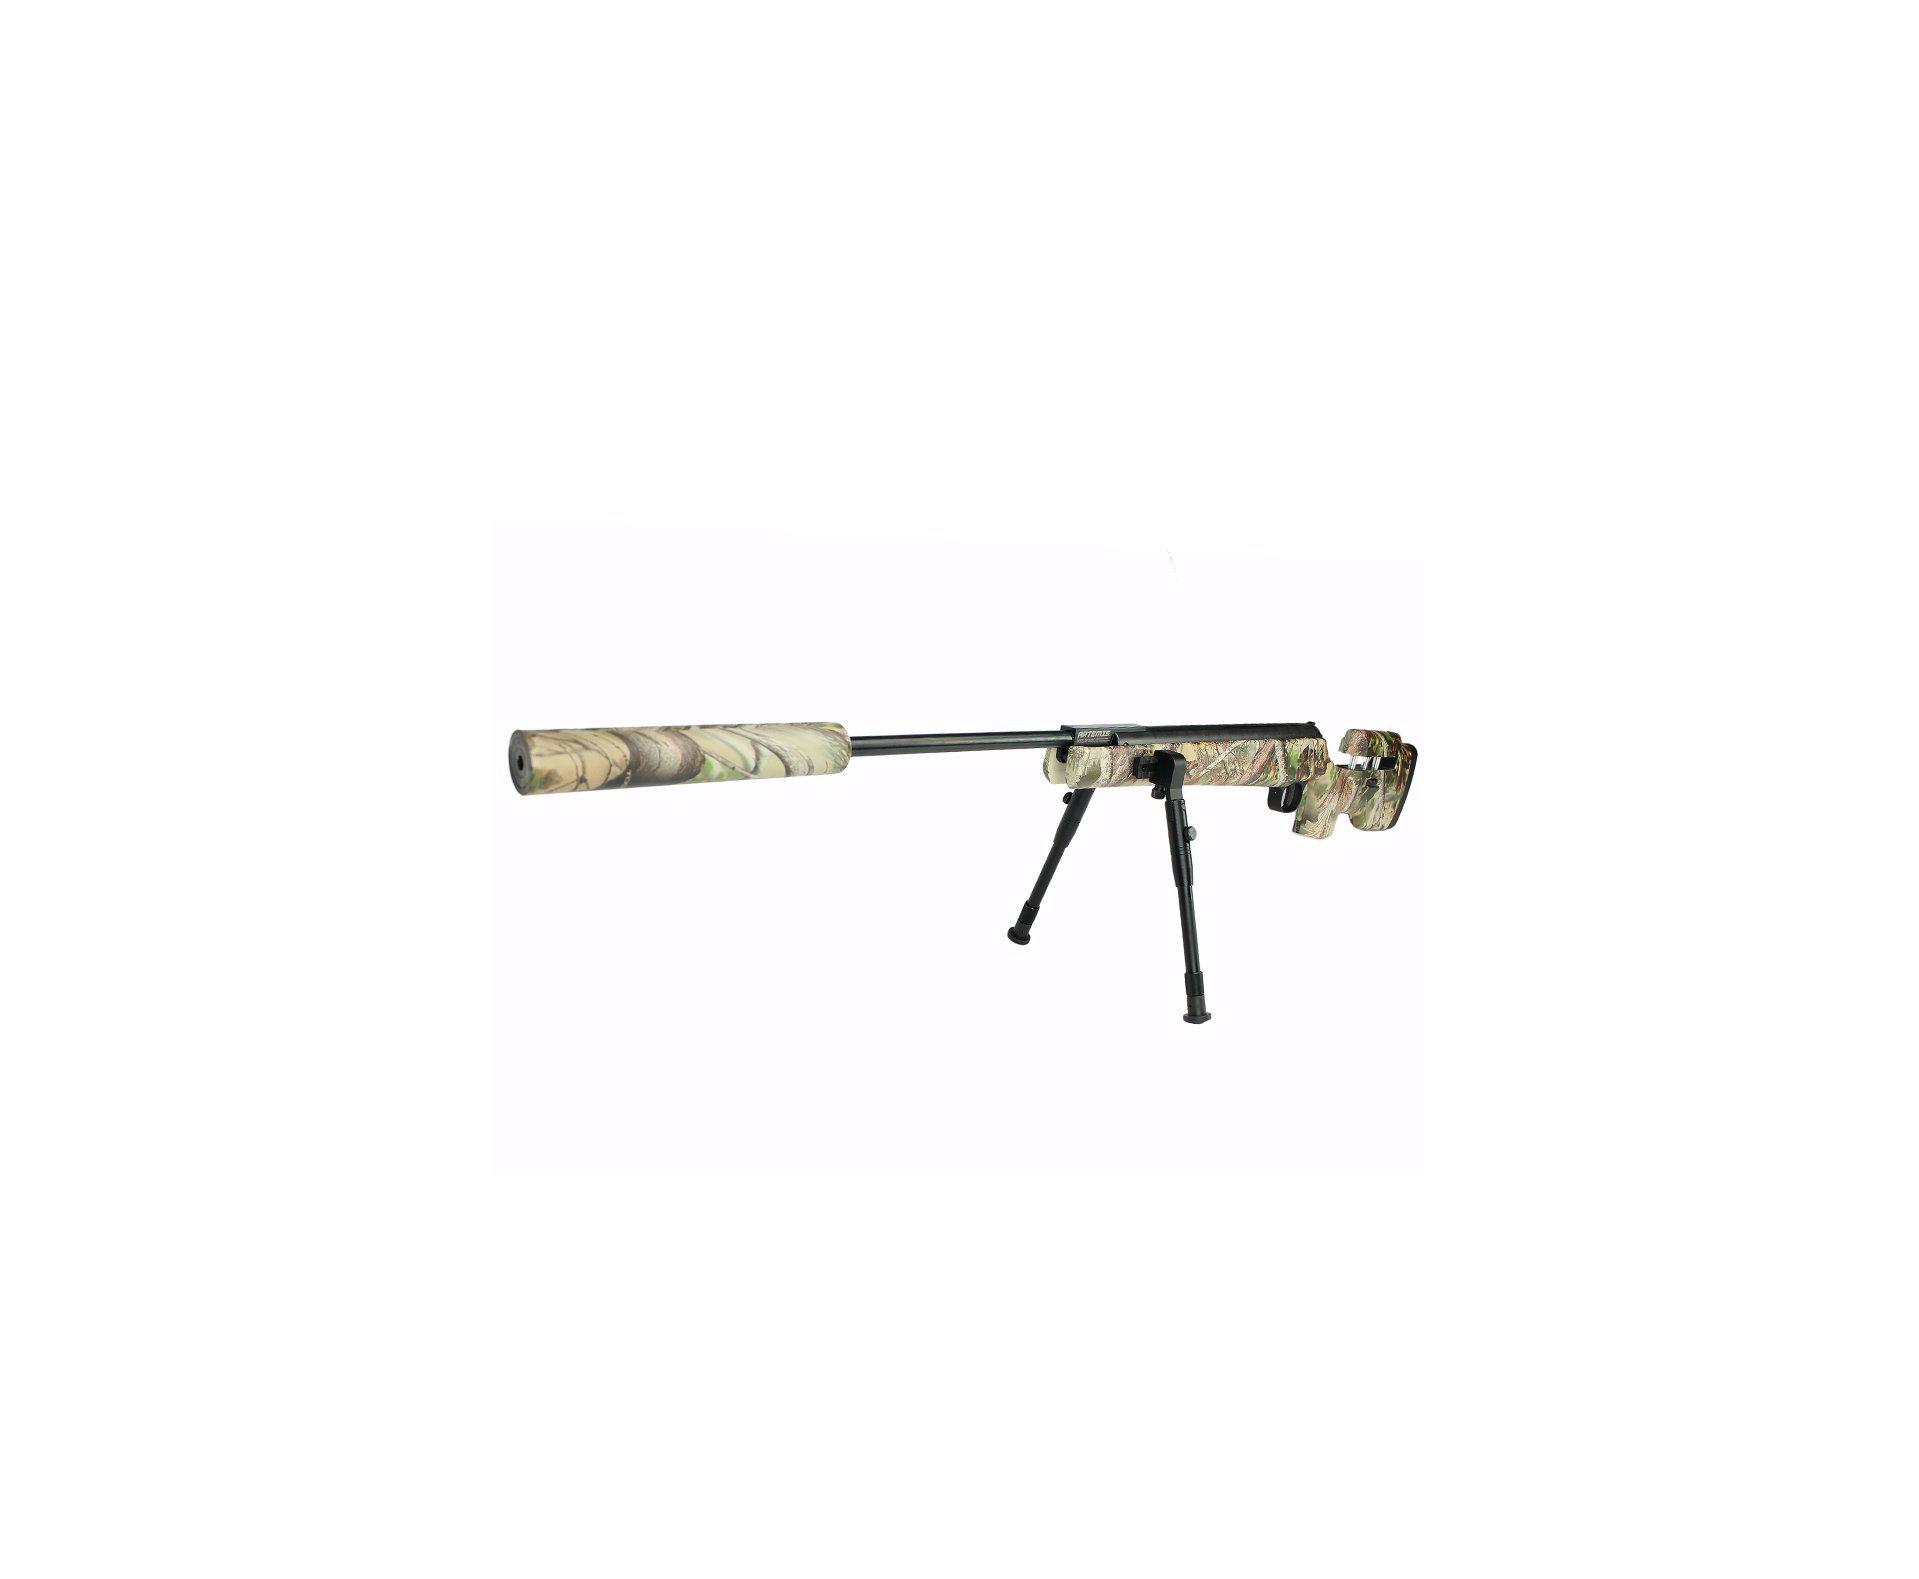 Carabina De Pressão Artemis Gp 1250c Sniper Gas Ram 70kg Camuflada 5.5mm